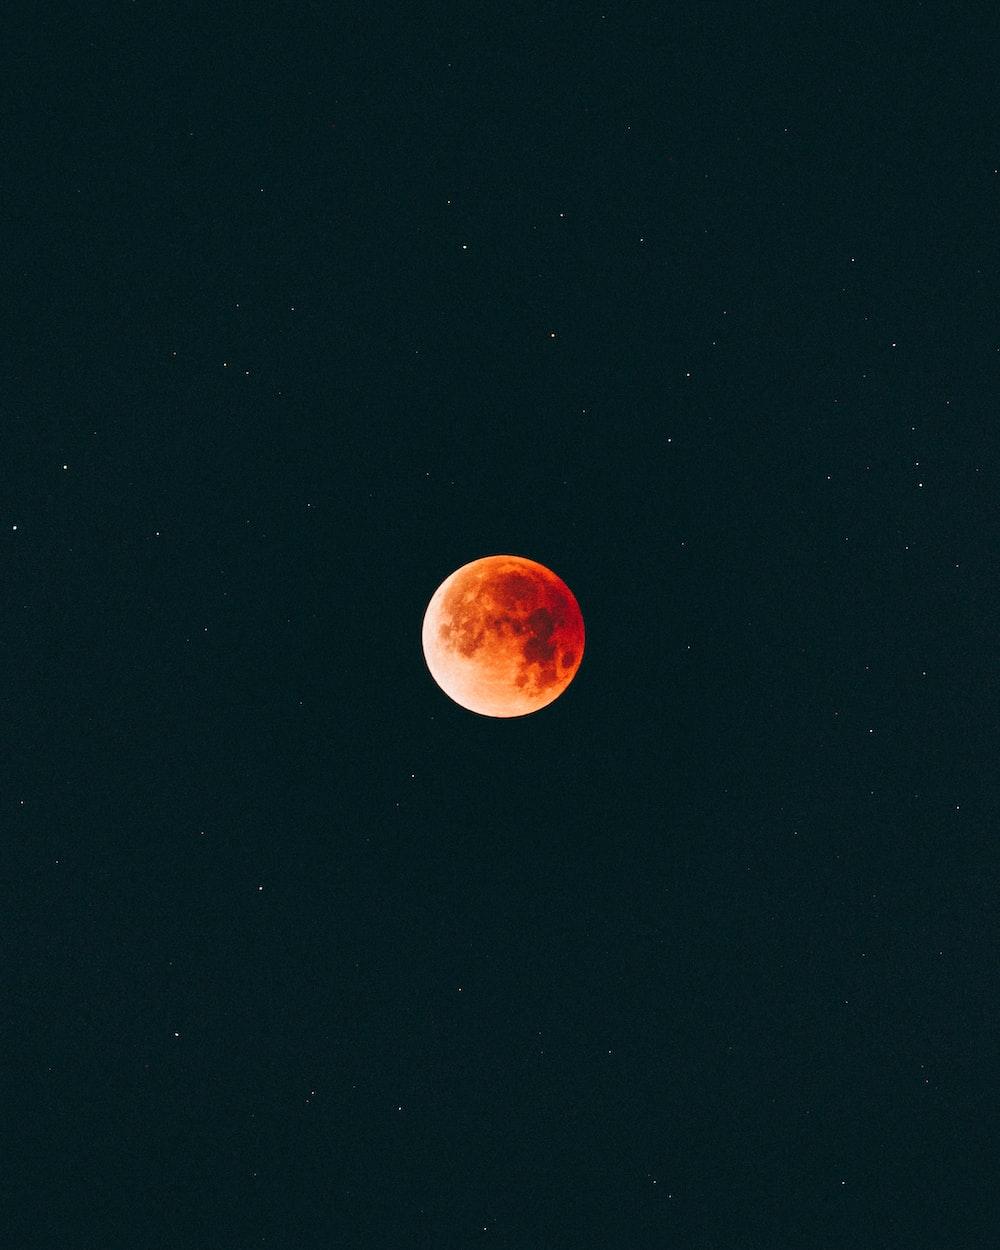 Best 100 moon images download free pictures on unsplash altavistaventures Images